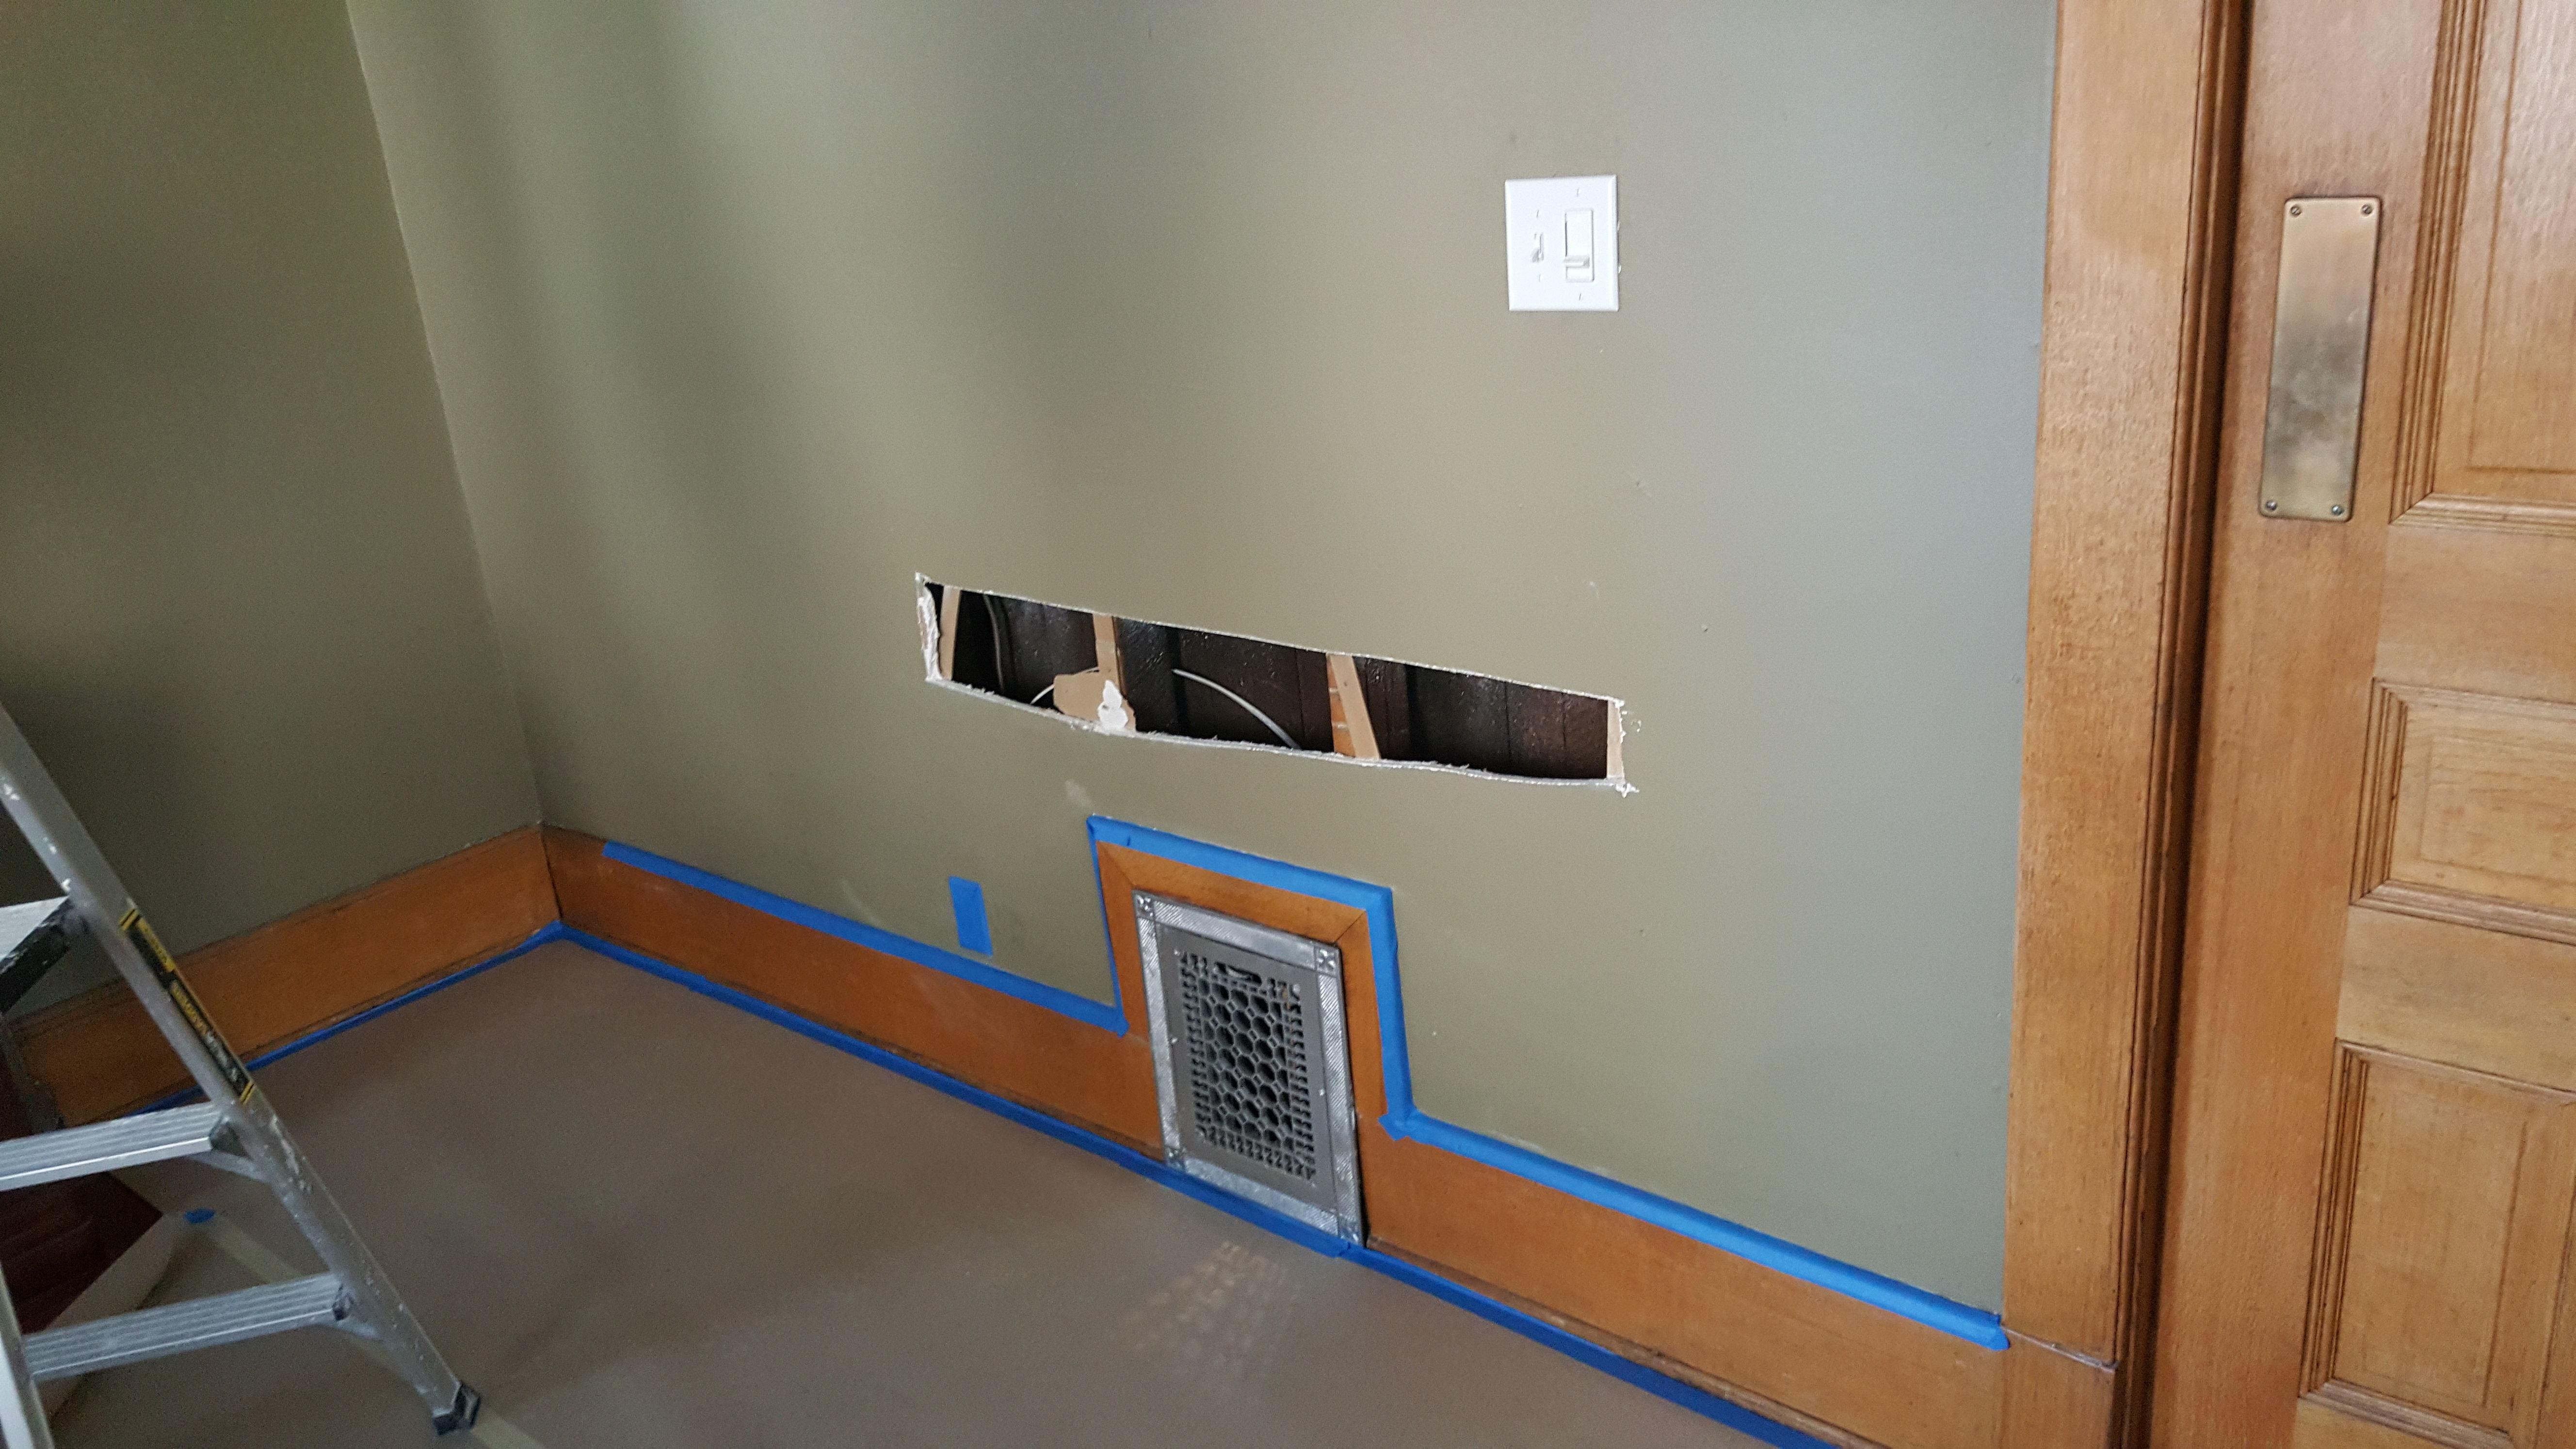 Accolade Drywall LLC image 1